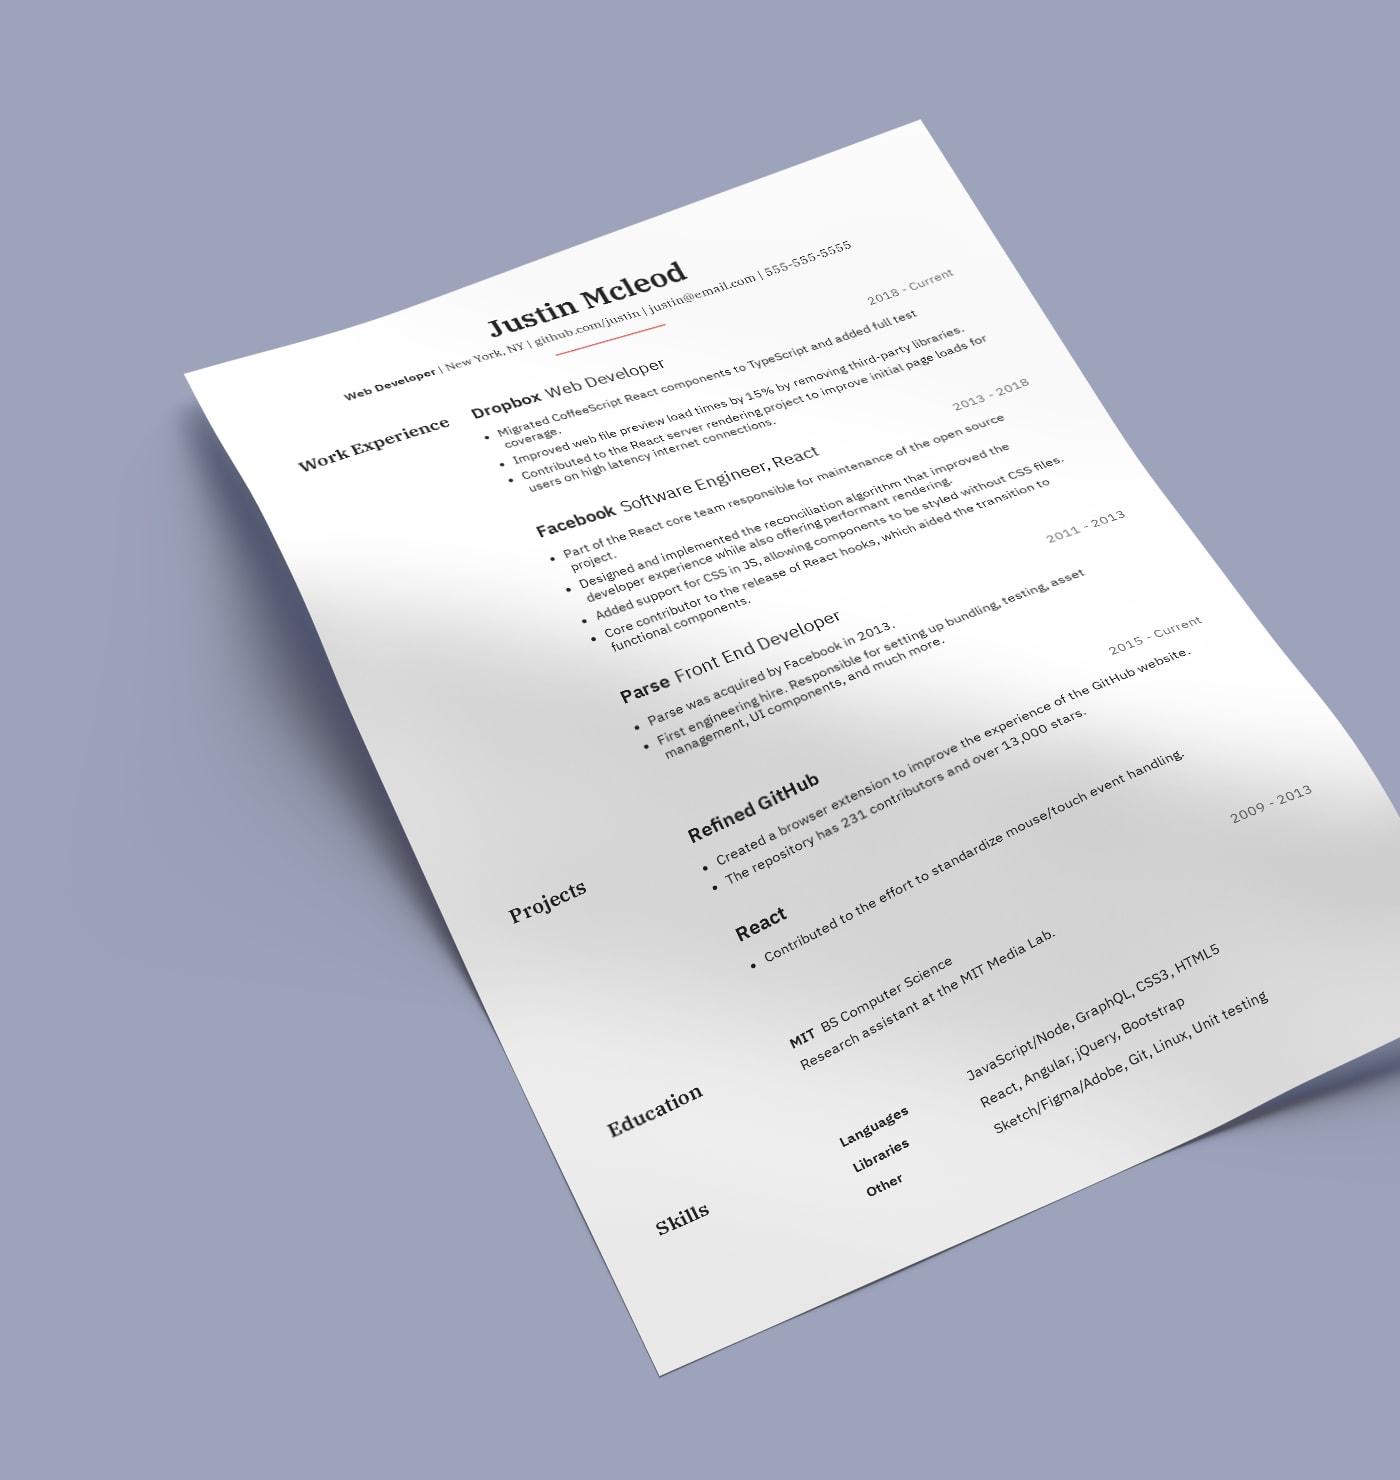 Venables professional resume template built with Standard Resume builder.